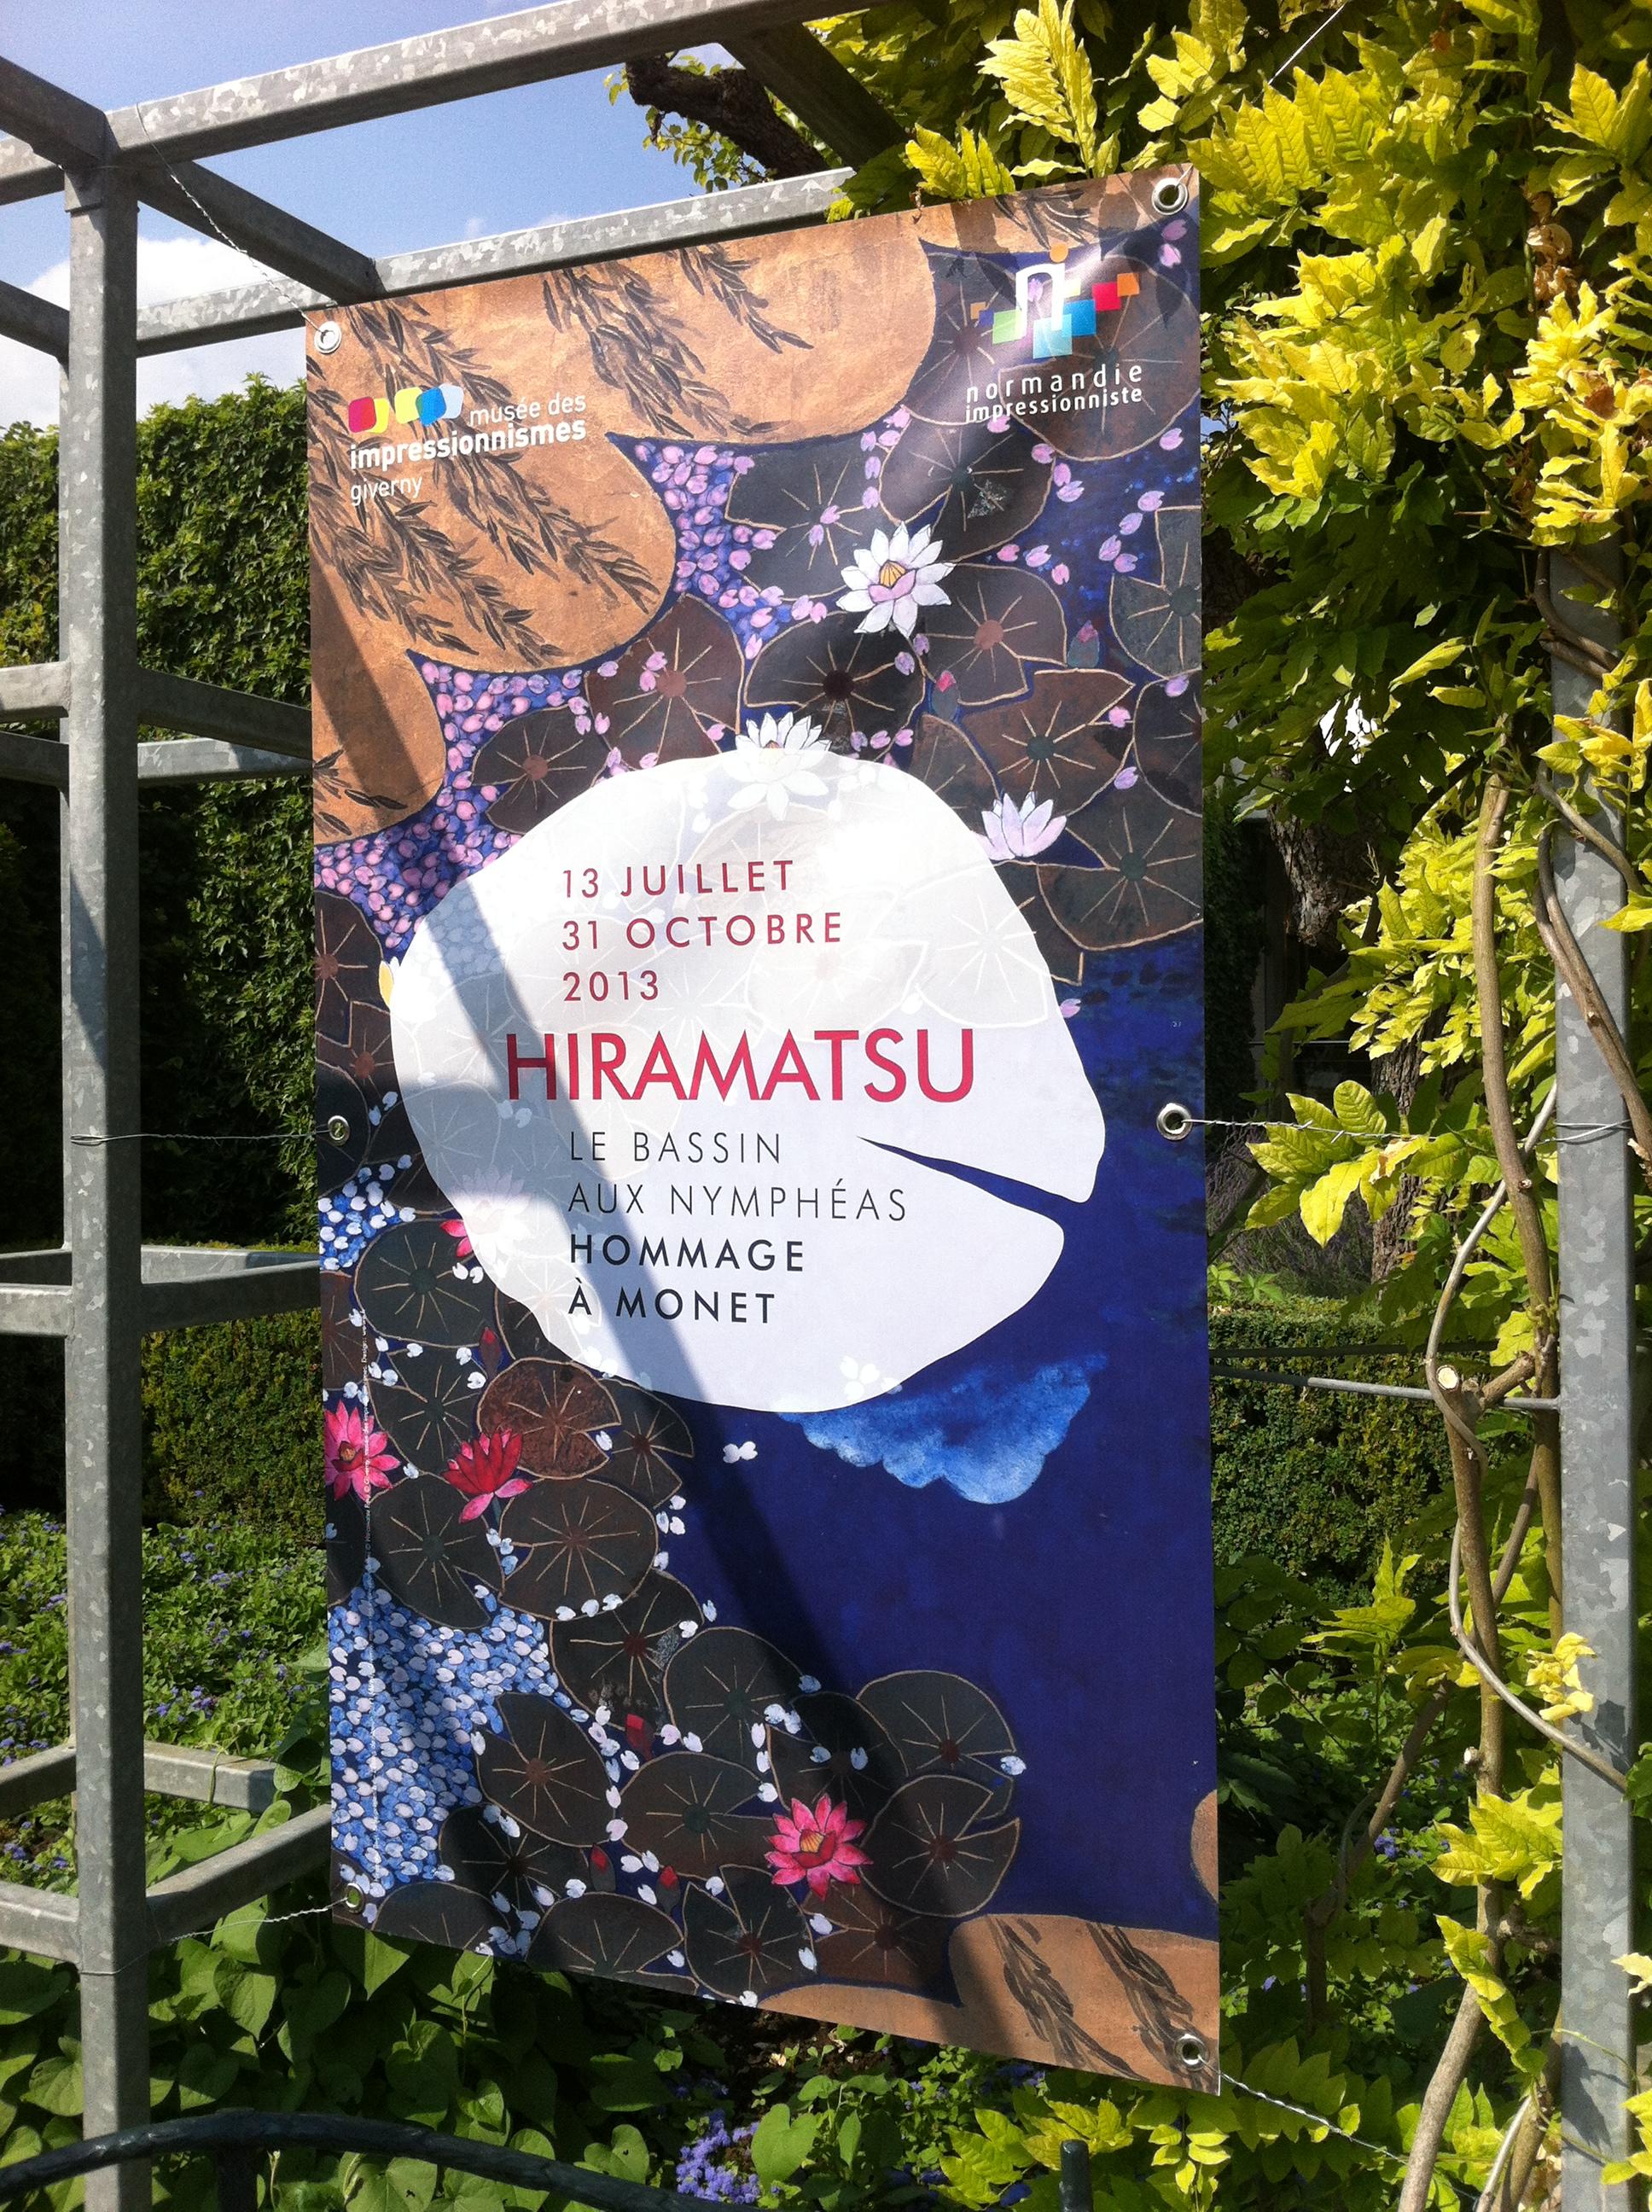 exposition hiramatsu giverny